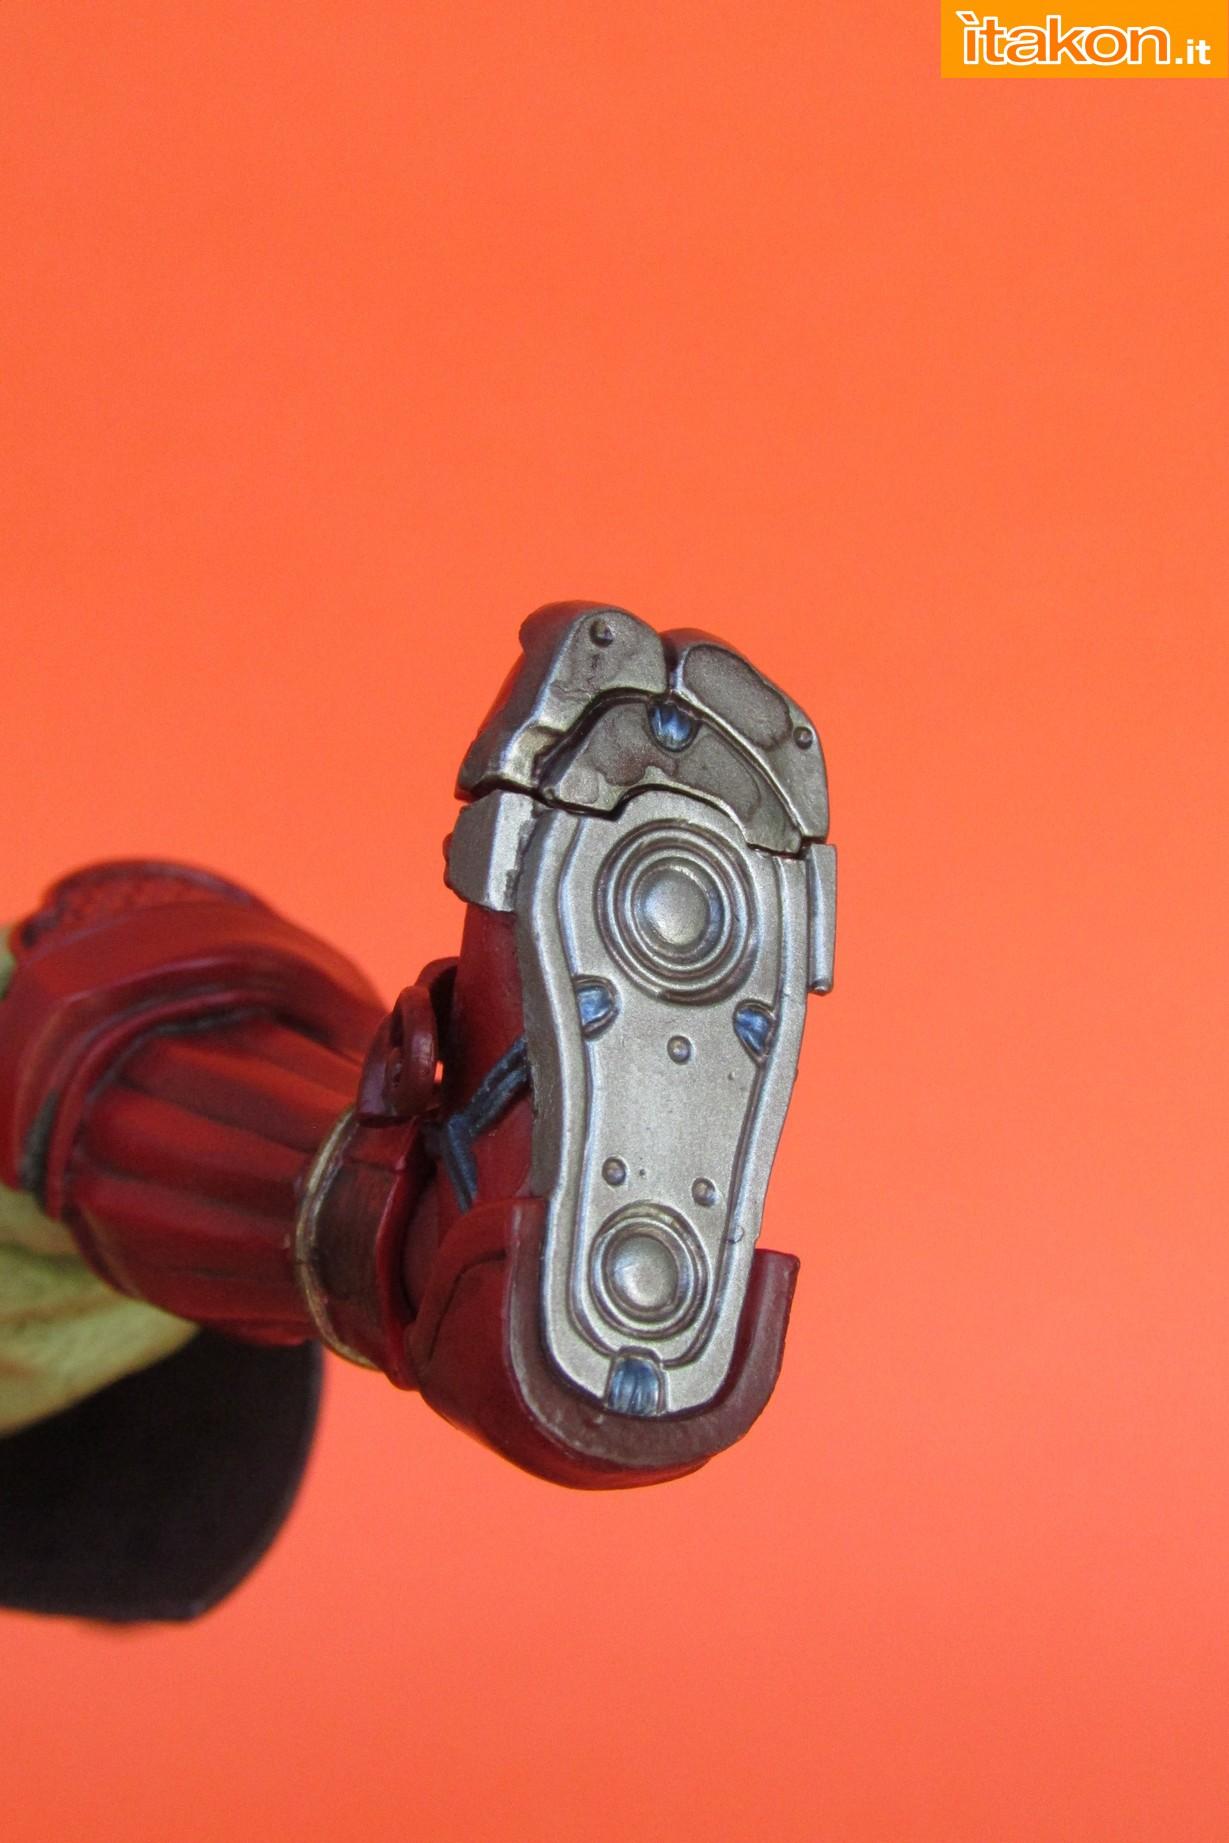 Link a Marvel Comics Koutetsu Samurai Iron Man Mark 3 Meishou MANGA REALIZATION review Bandai Itakon.it33